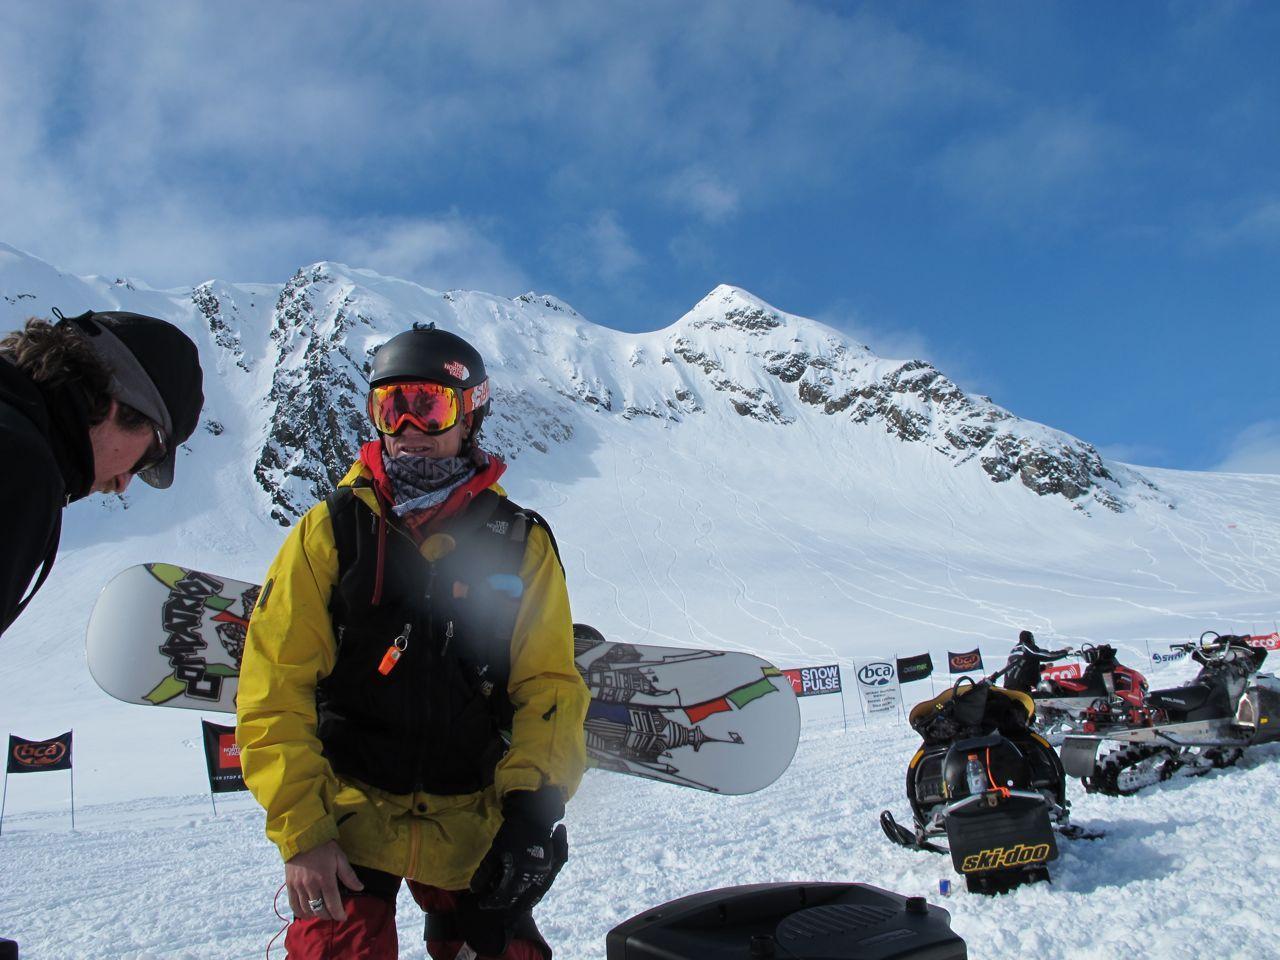 Skiing & Snowboarding Unite In Tailgate Alaska's Recco World Freeriding Championships